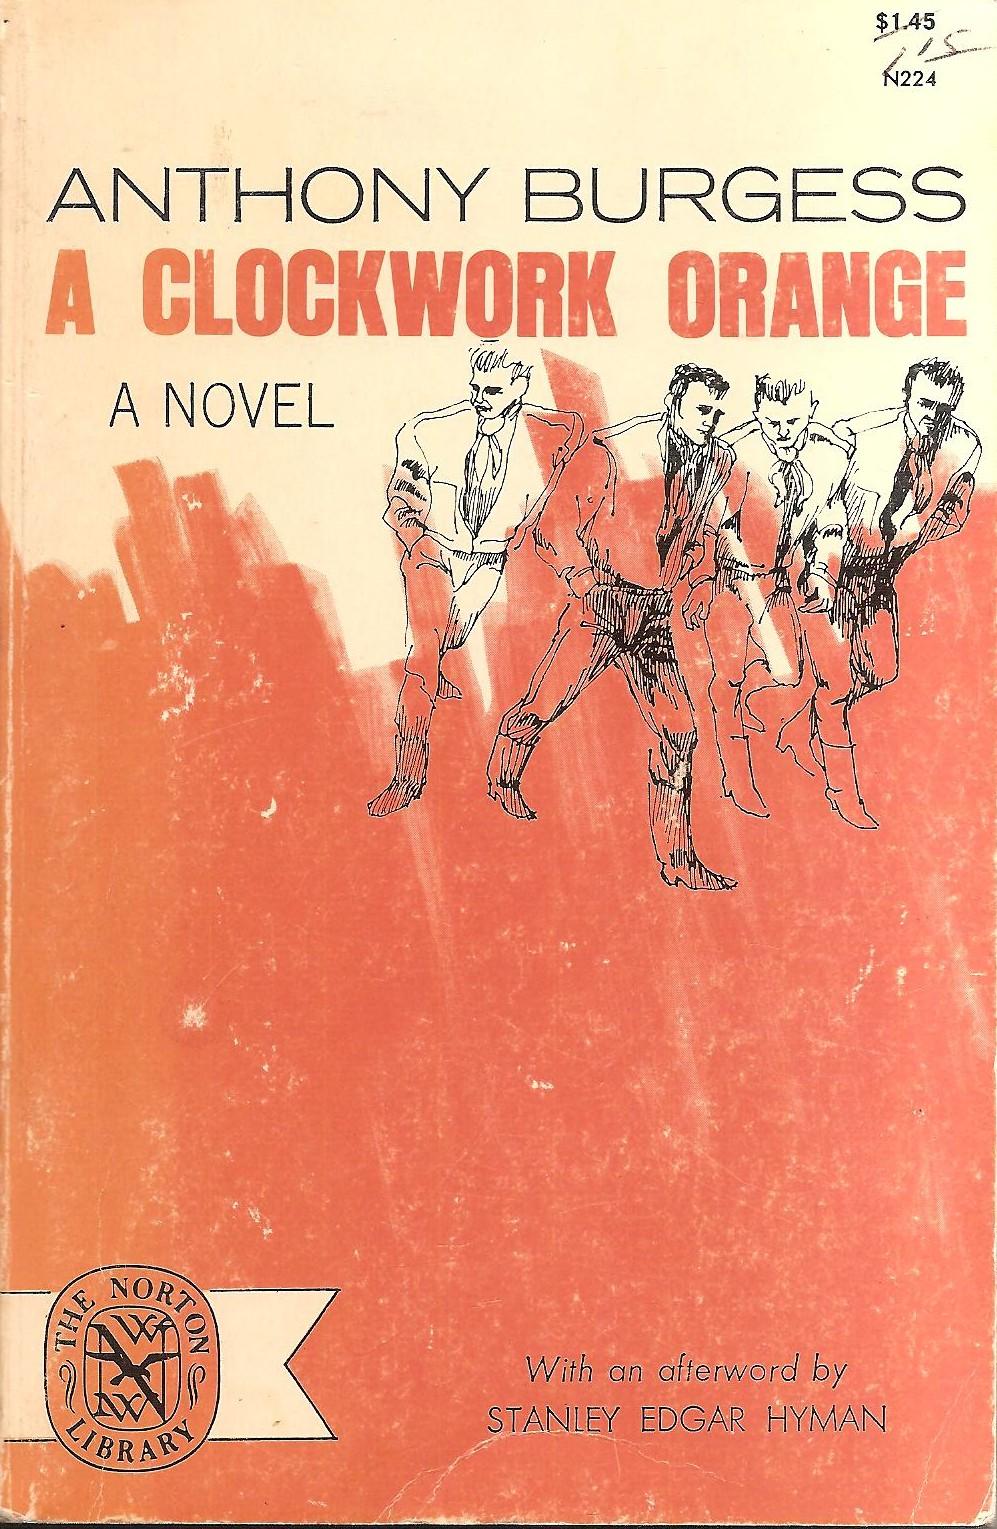 an essay on a clockwork orange by anthony burgess